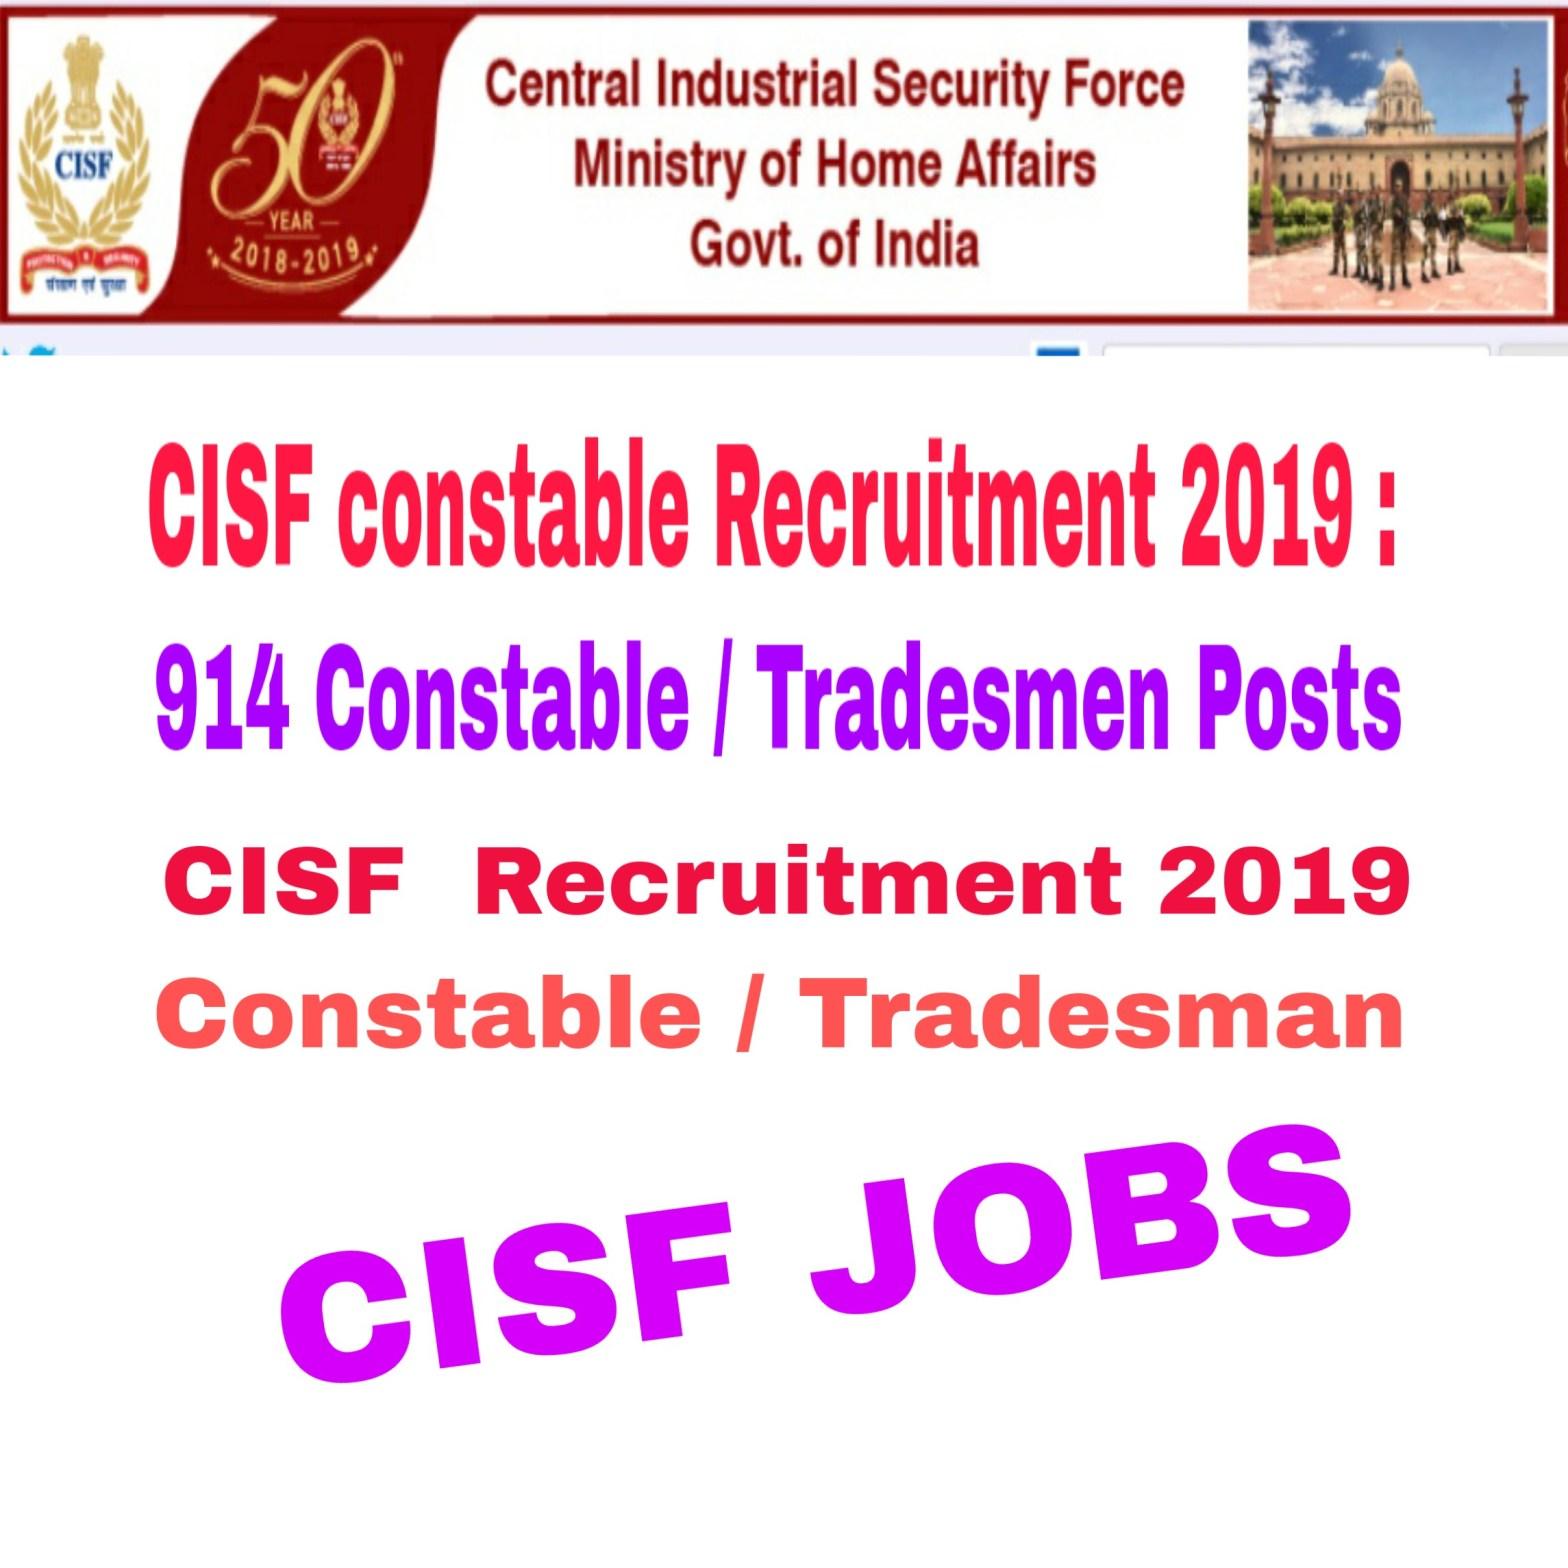 CISF Recruitment 2019 : 914 Constable / Tradesmen Posts